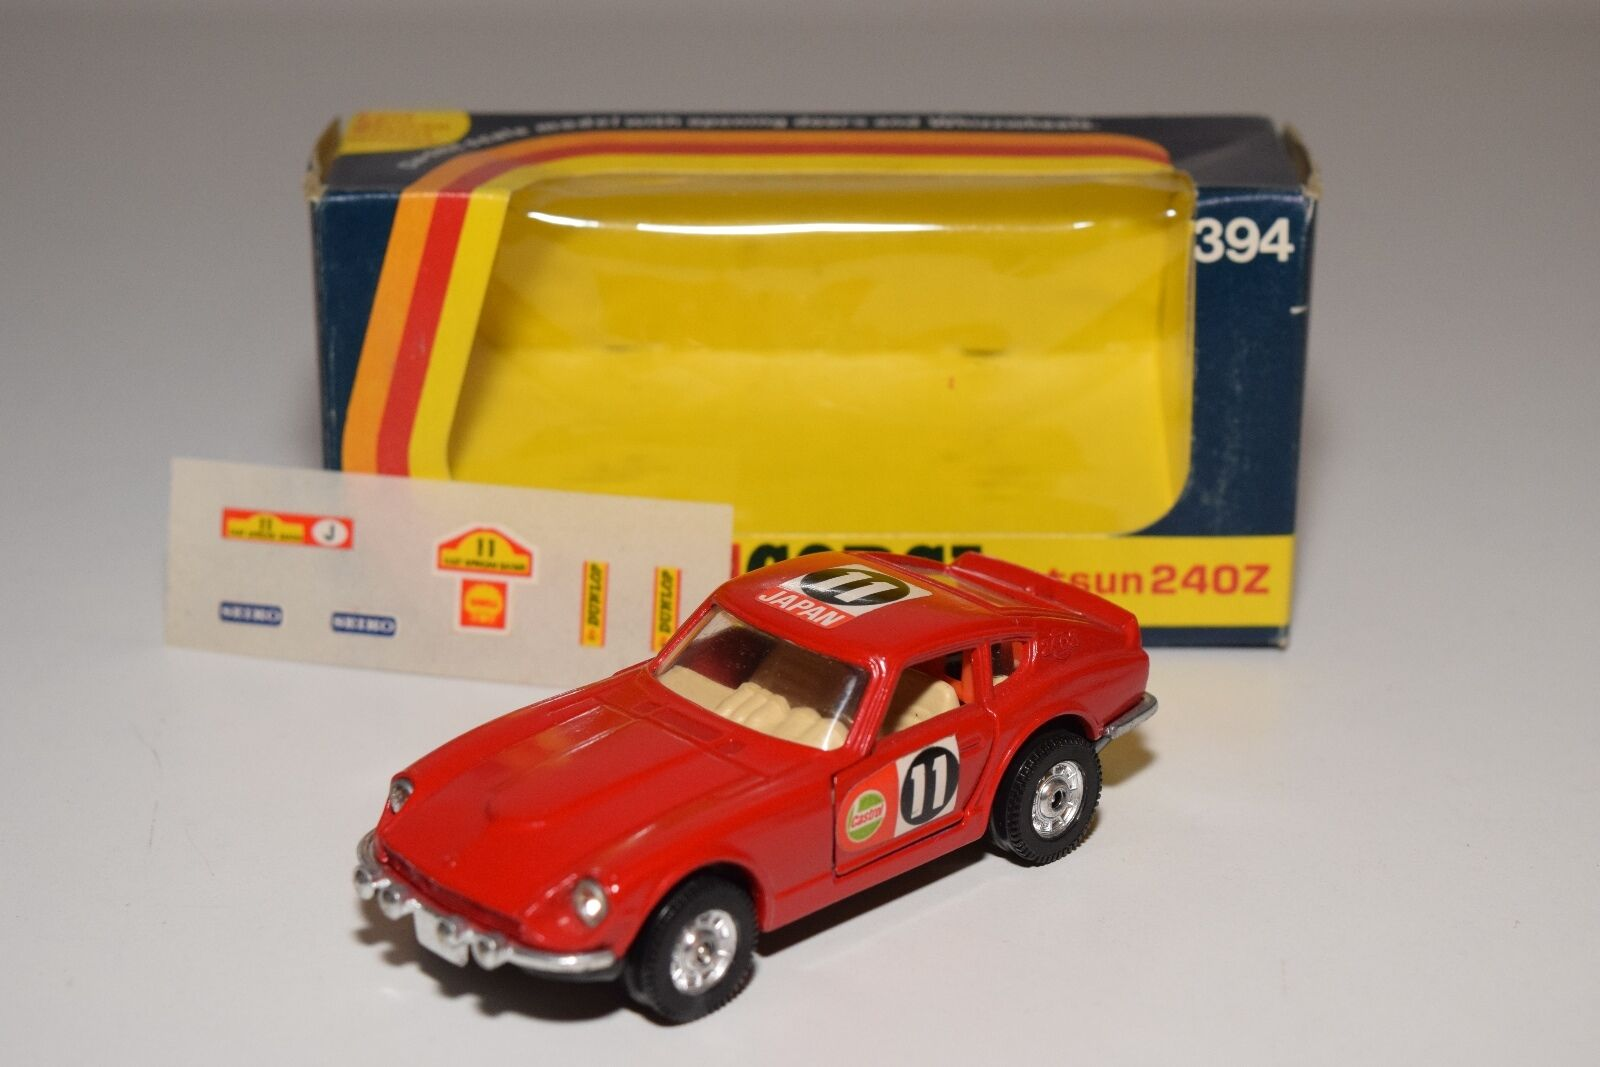 \\ CORGI TOYS 394 DATSUN 240Z 240 Z RALLY  rouge MINT BOXED + DECAL SHEET  livraison gratuite